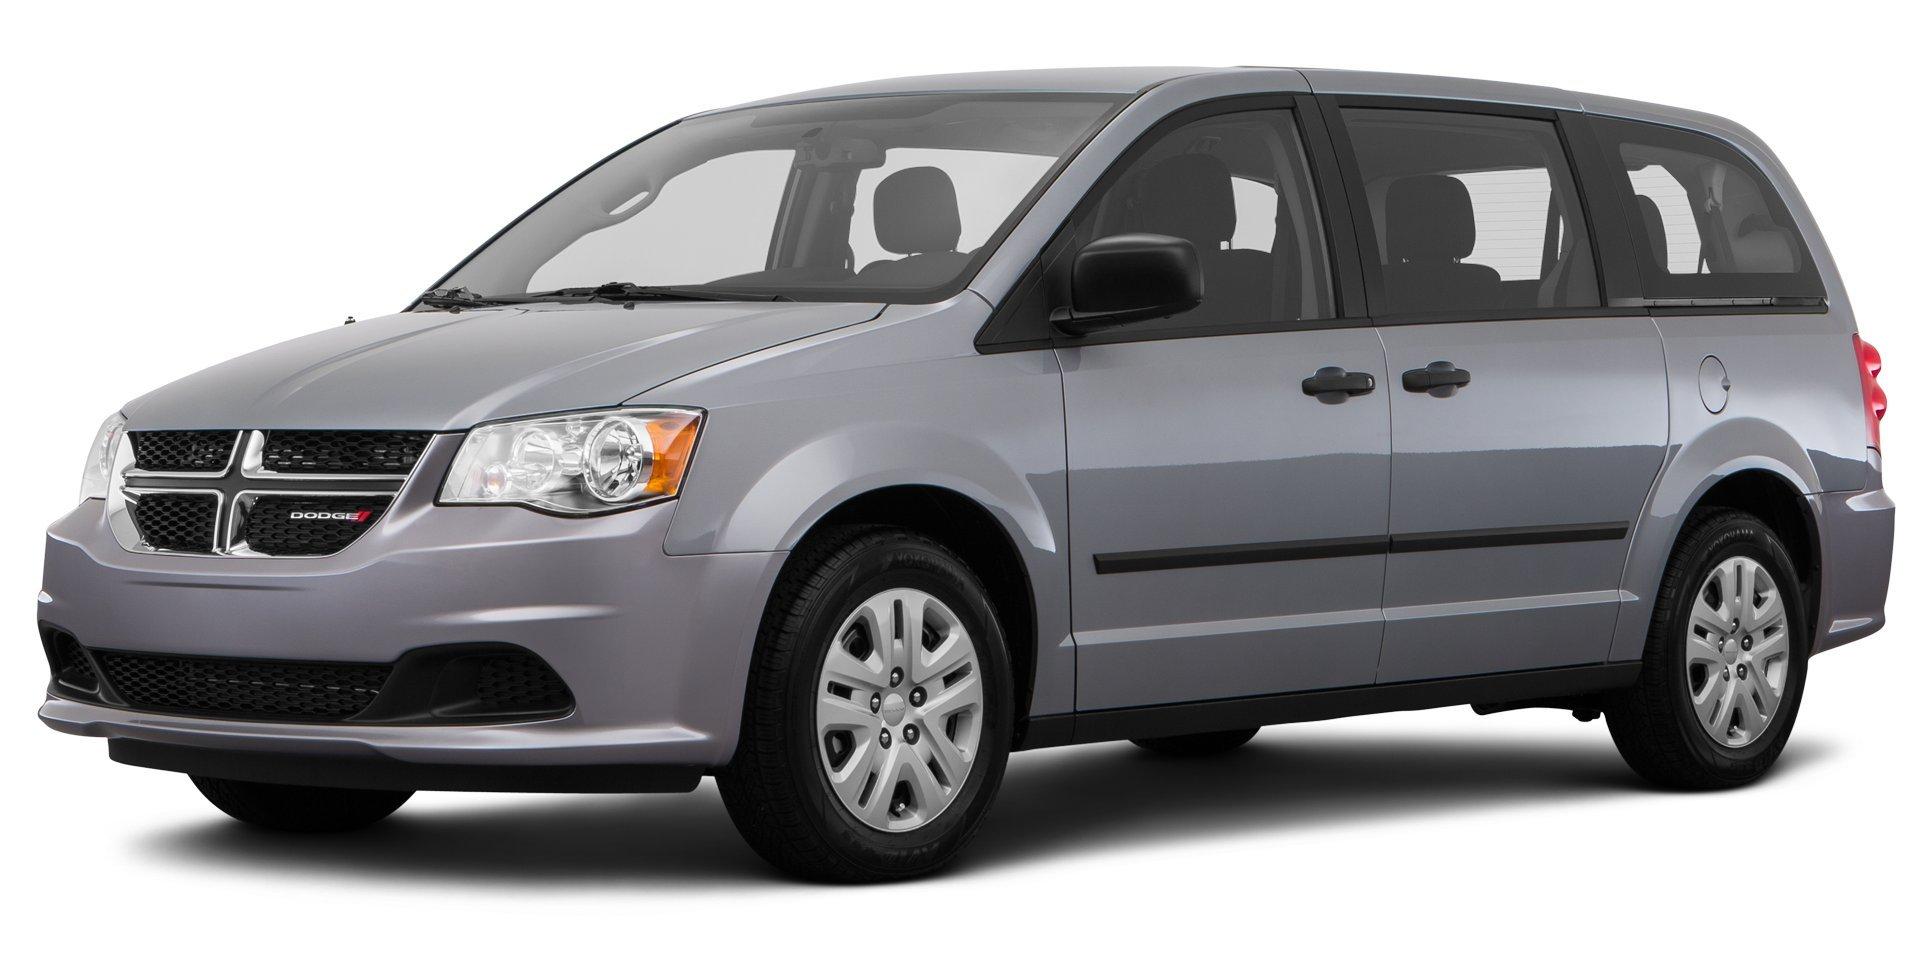 2015 Dodge Grand Caravan Sxt >> 2015 Dodge Grand Caravan